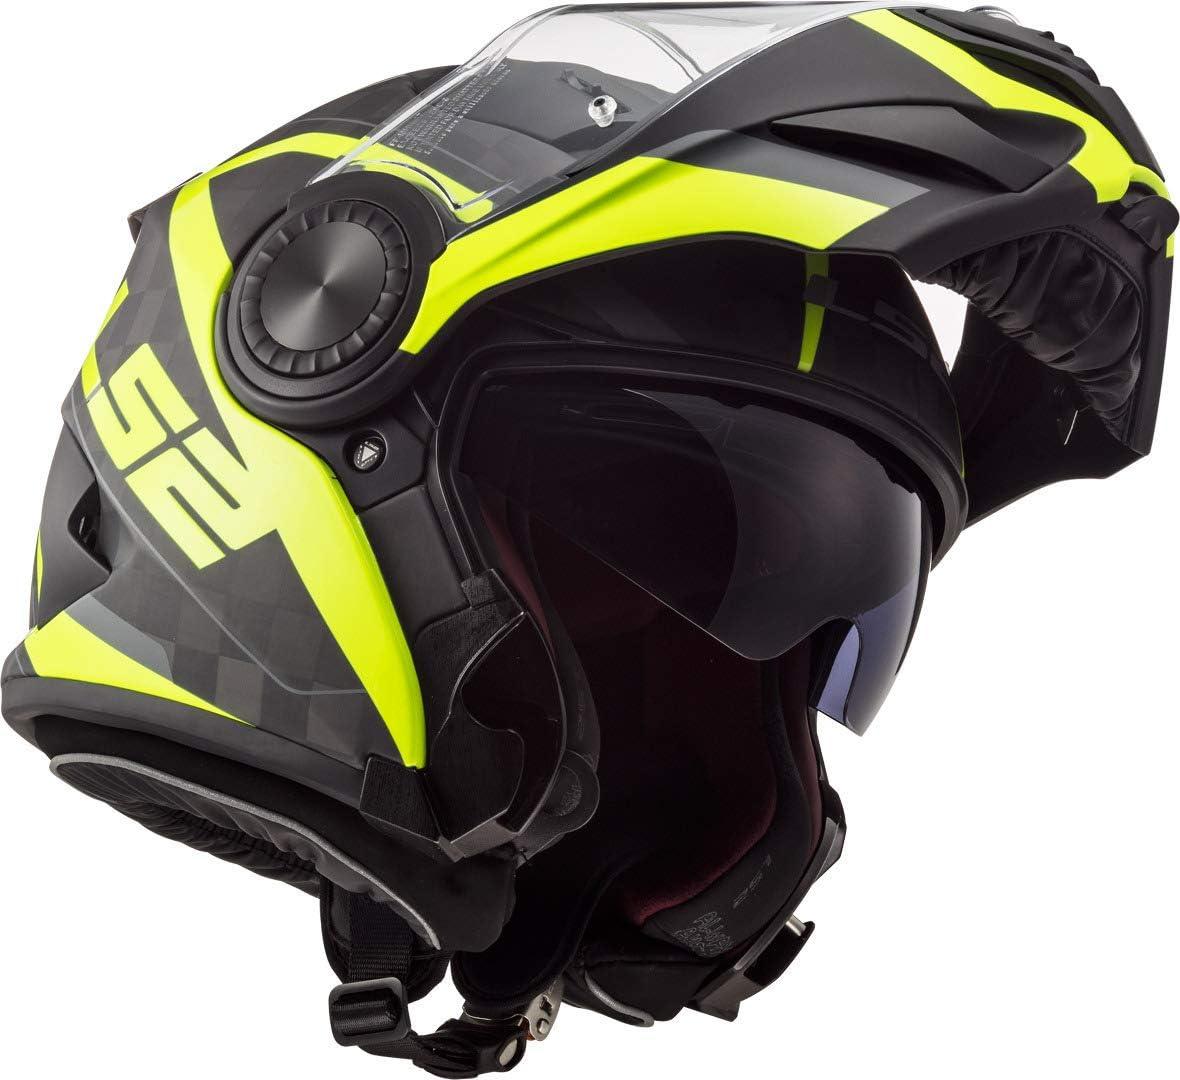 LS2 Casque moto FF313 VORTEX FRAME CARBON HI VIS Jaune XS Noir//Jaune